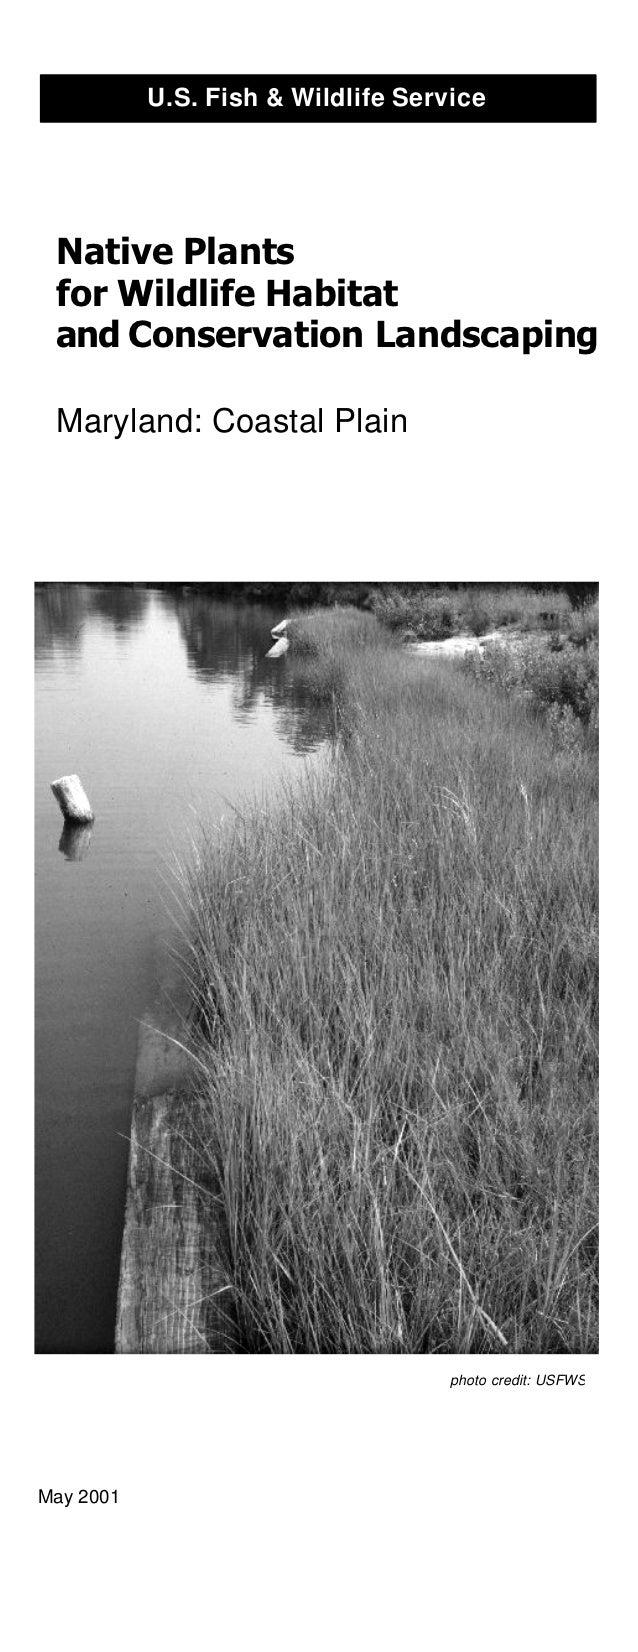 U.S. Fish & Wildlife Service Native Plants for Wildlife Habitat and Conservation Landscaping Maryland: Coastal Plain      ...